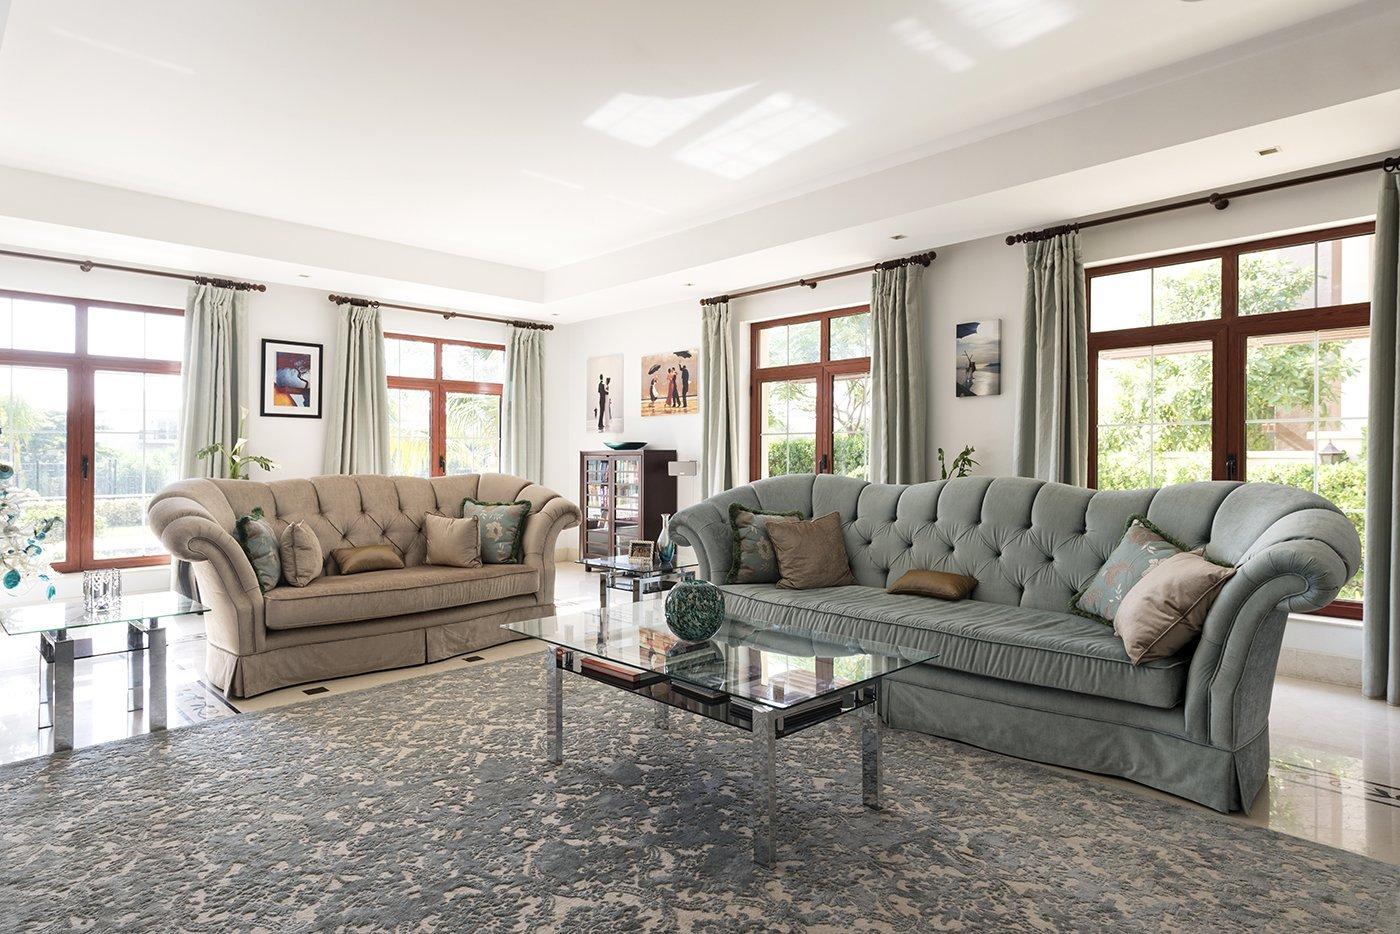 residential interior photography dubai interior photographer